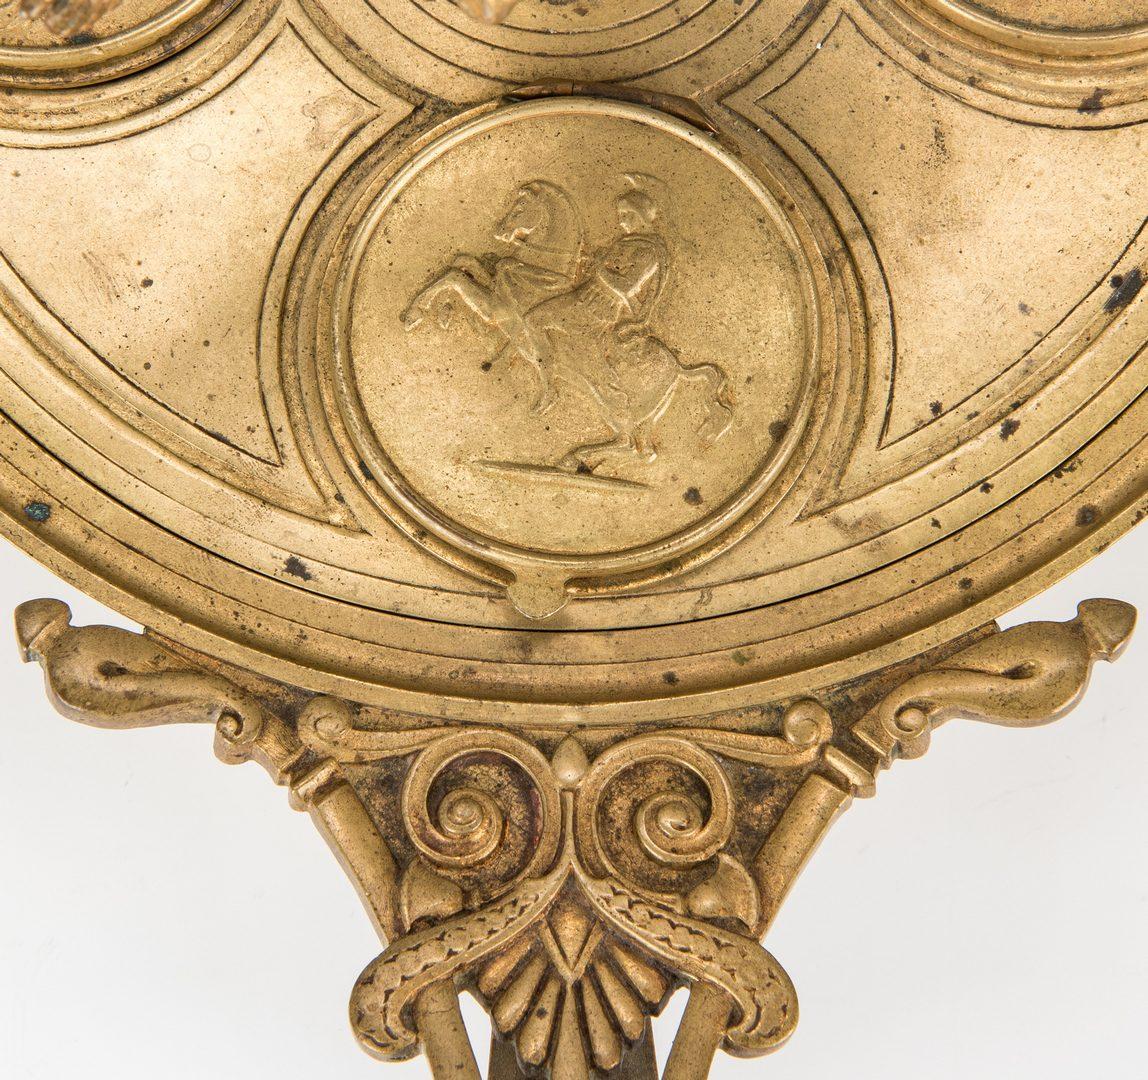 Lot 69: 2 Inkwells, incl. Classical Figure & Lion